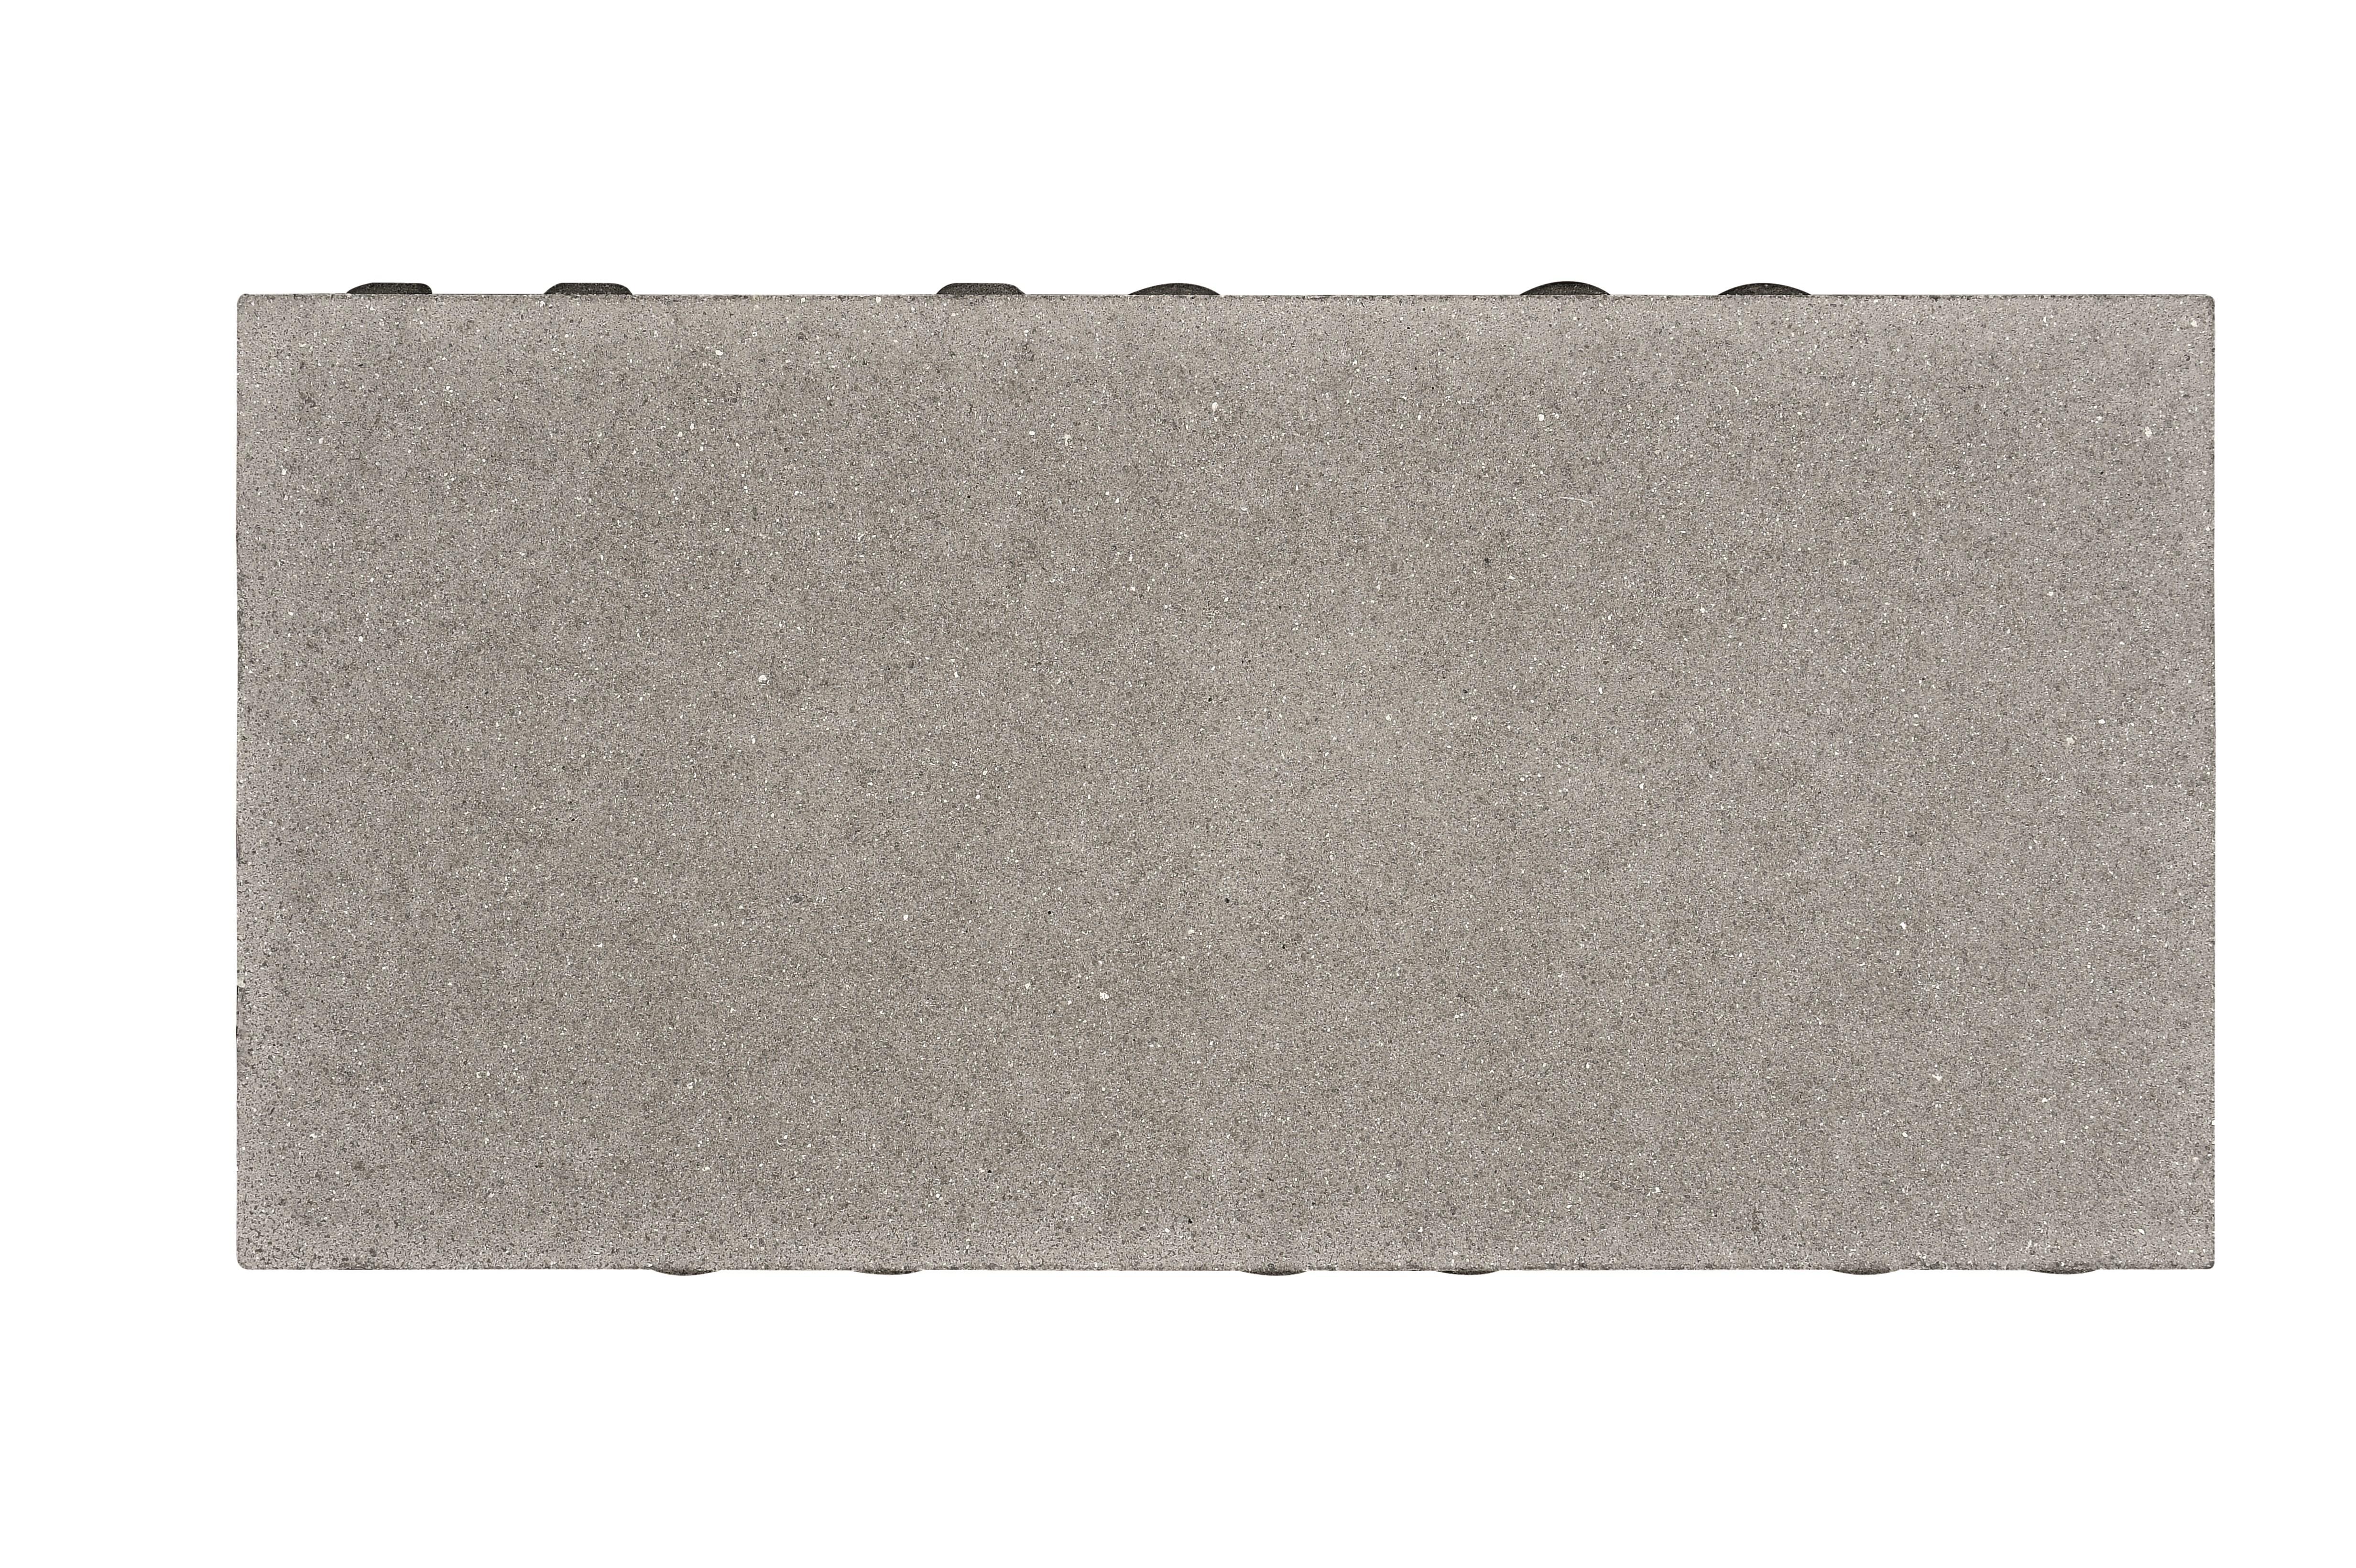 tetrago pflaster silco s=80 mm, kombilage d - grau   www.kemmler.de